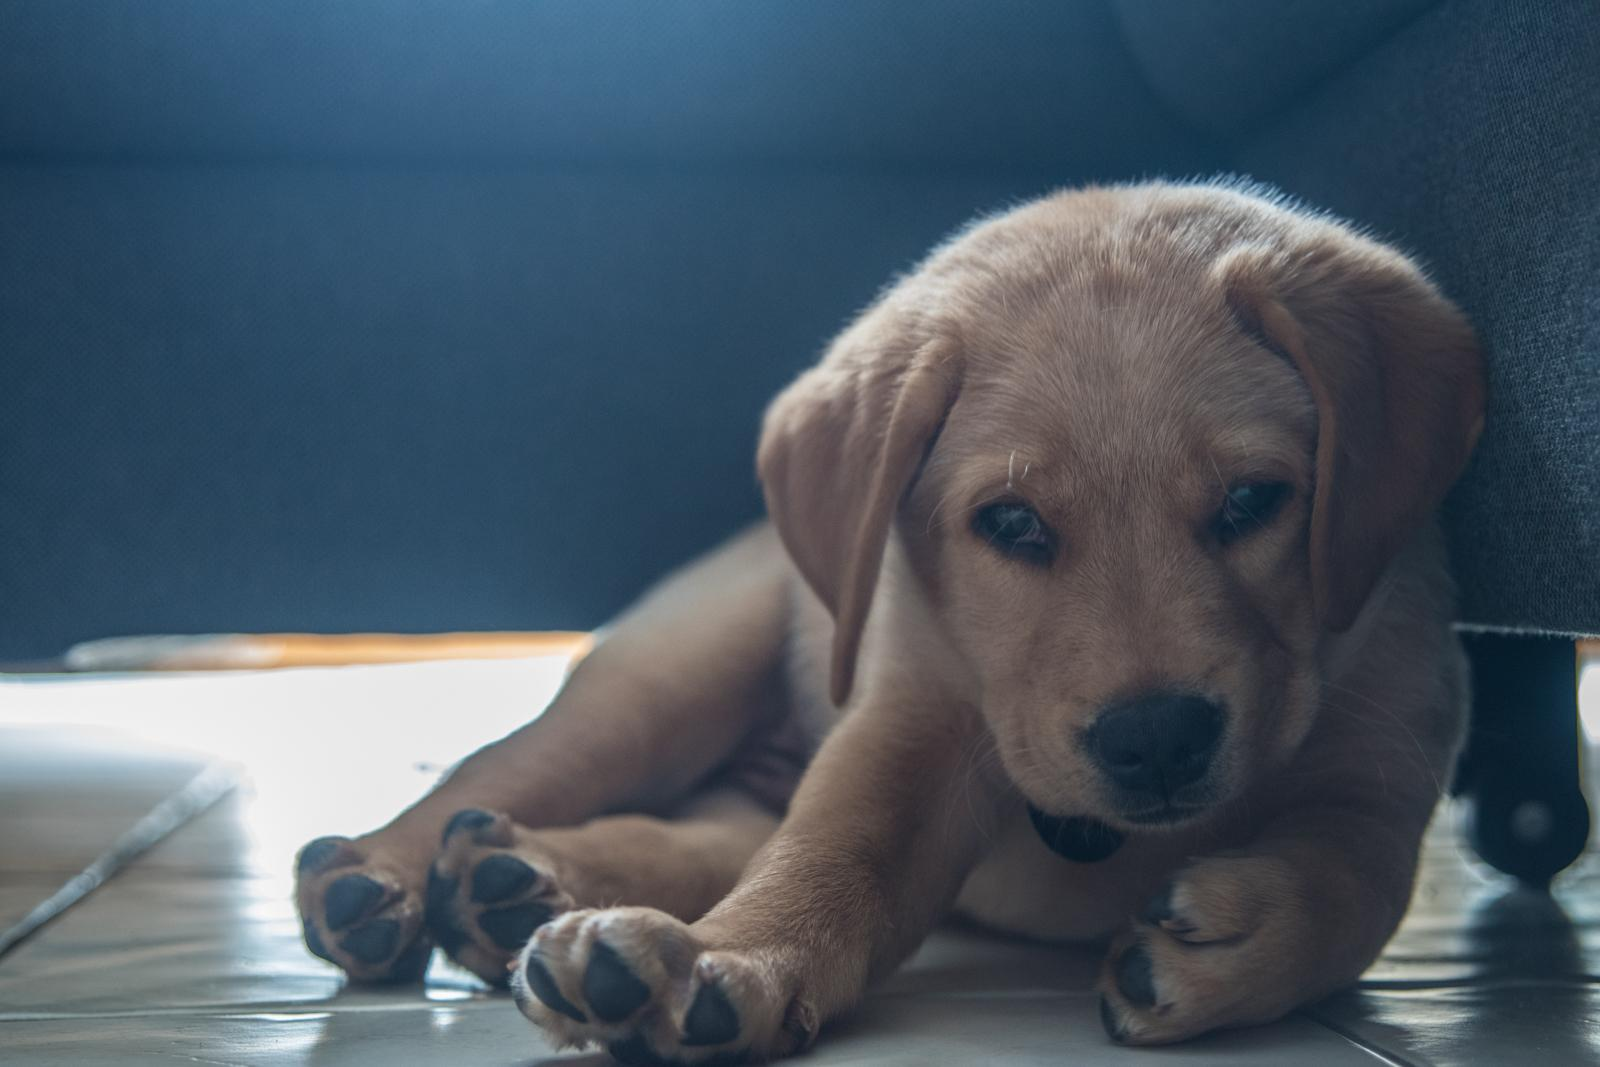 Tierfotograf-Labrador-Sven's Bildwerke-Hund-Hundefotografie20